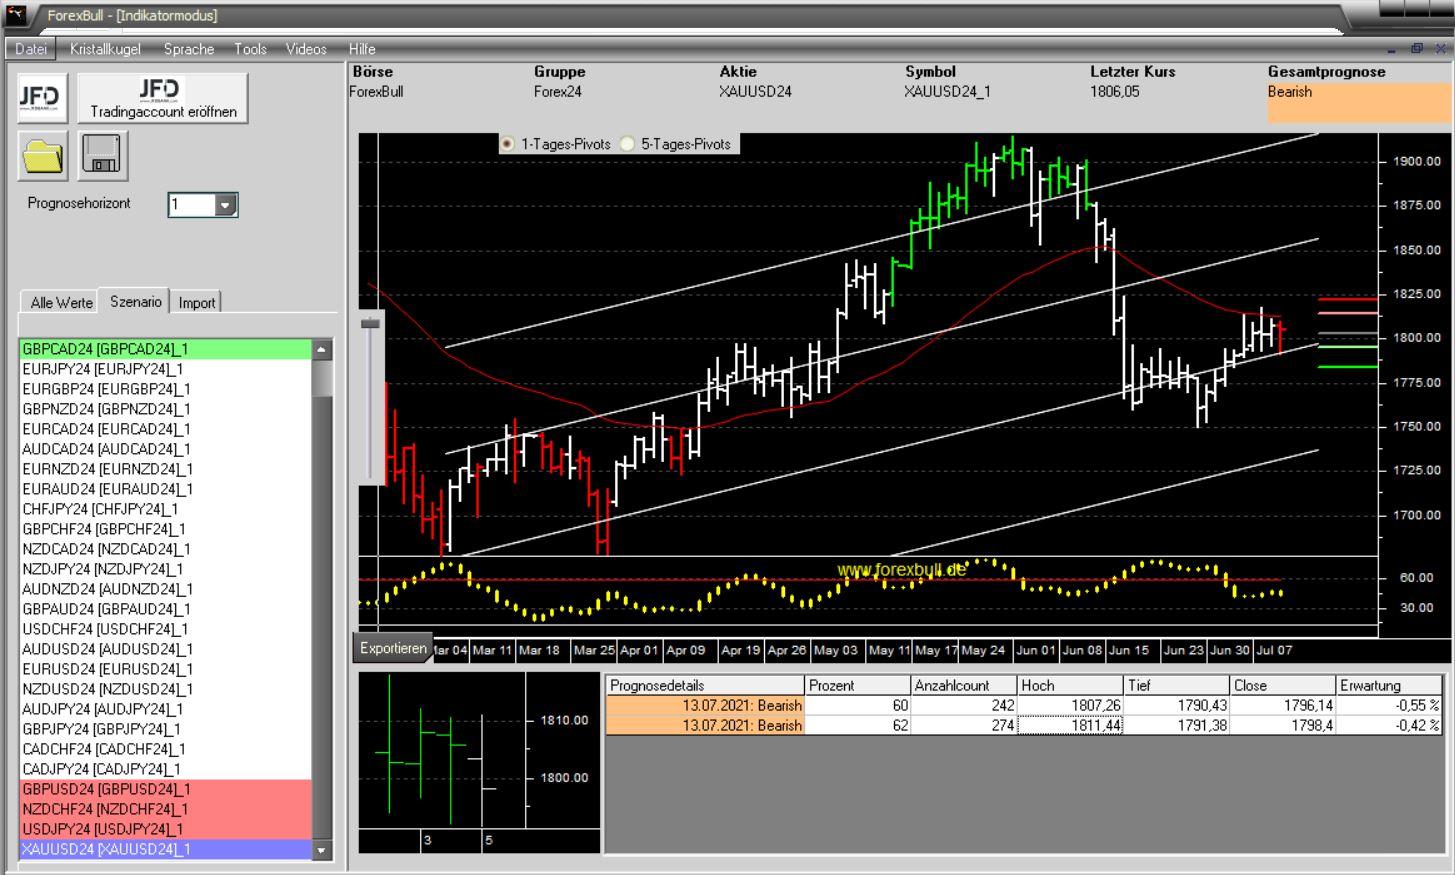 Morning-Briefing-ForexBull-GOLD-erneut-mit-einem-Short-Setup-Chartanalyse-JFD-Bank-GodmodeTrader.de-3